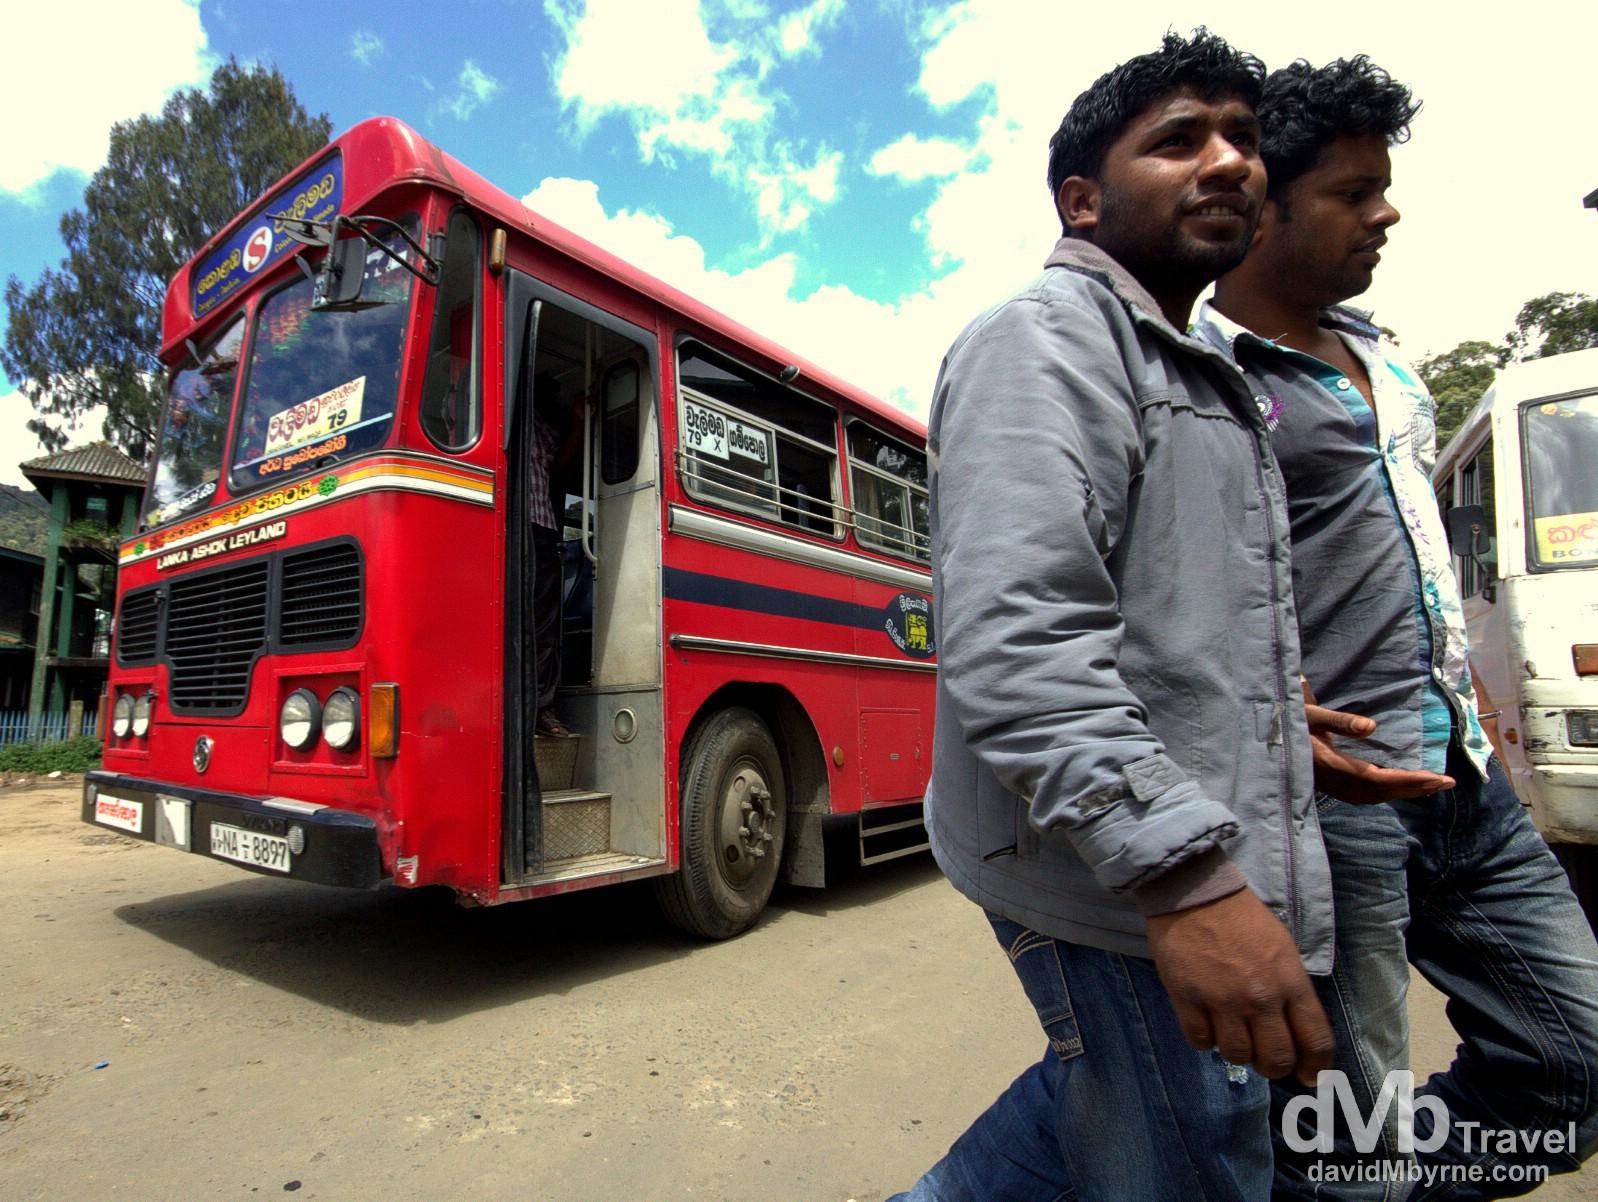 Nuwera Eliya bus station, Sri Lanka. September 6th 2012.